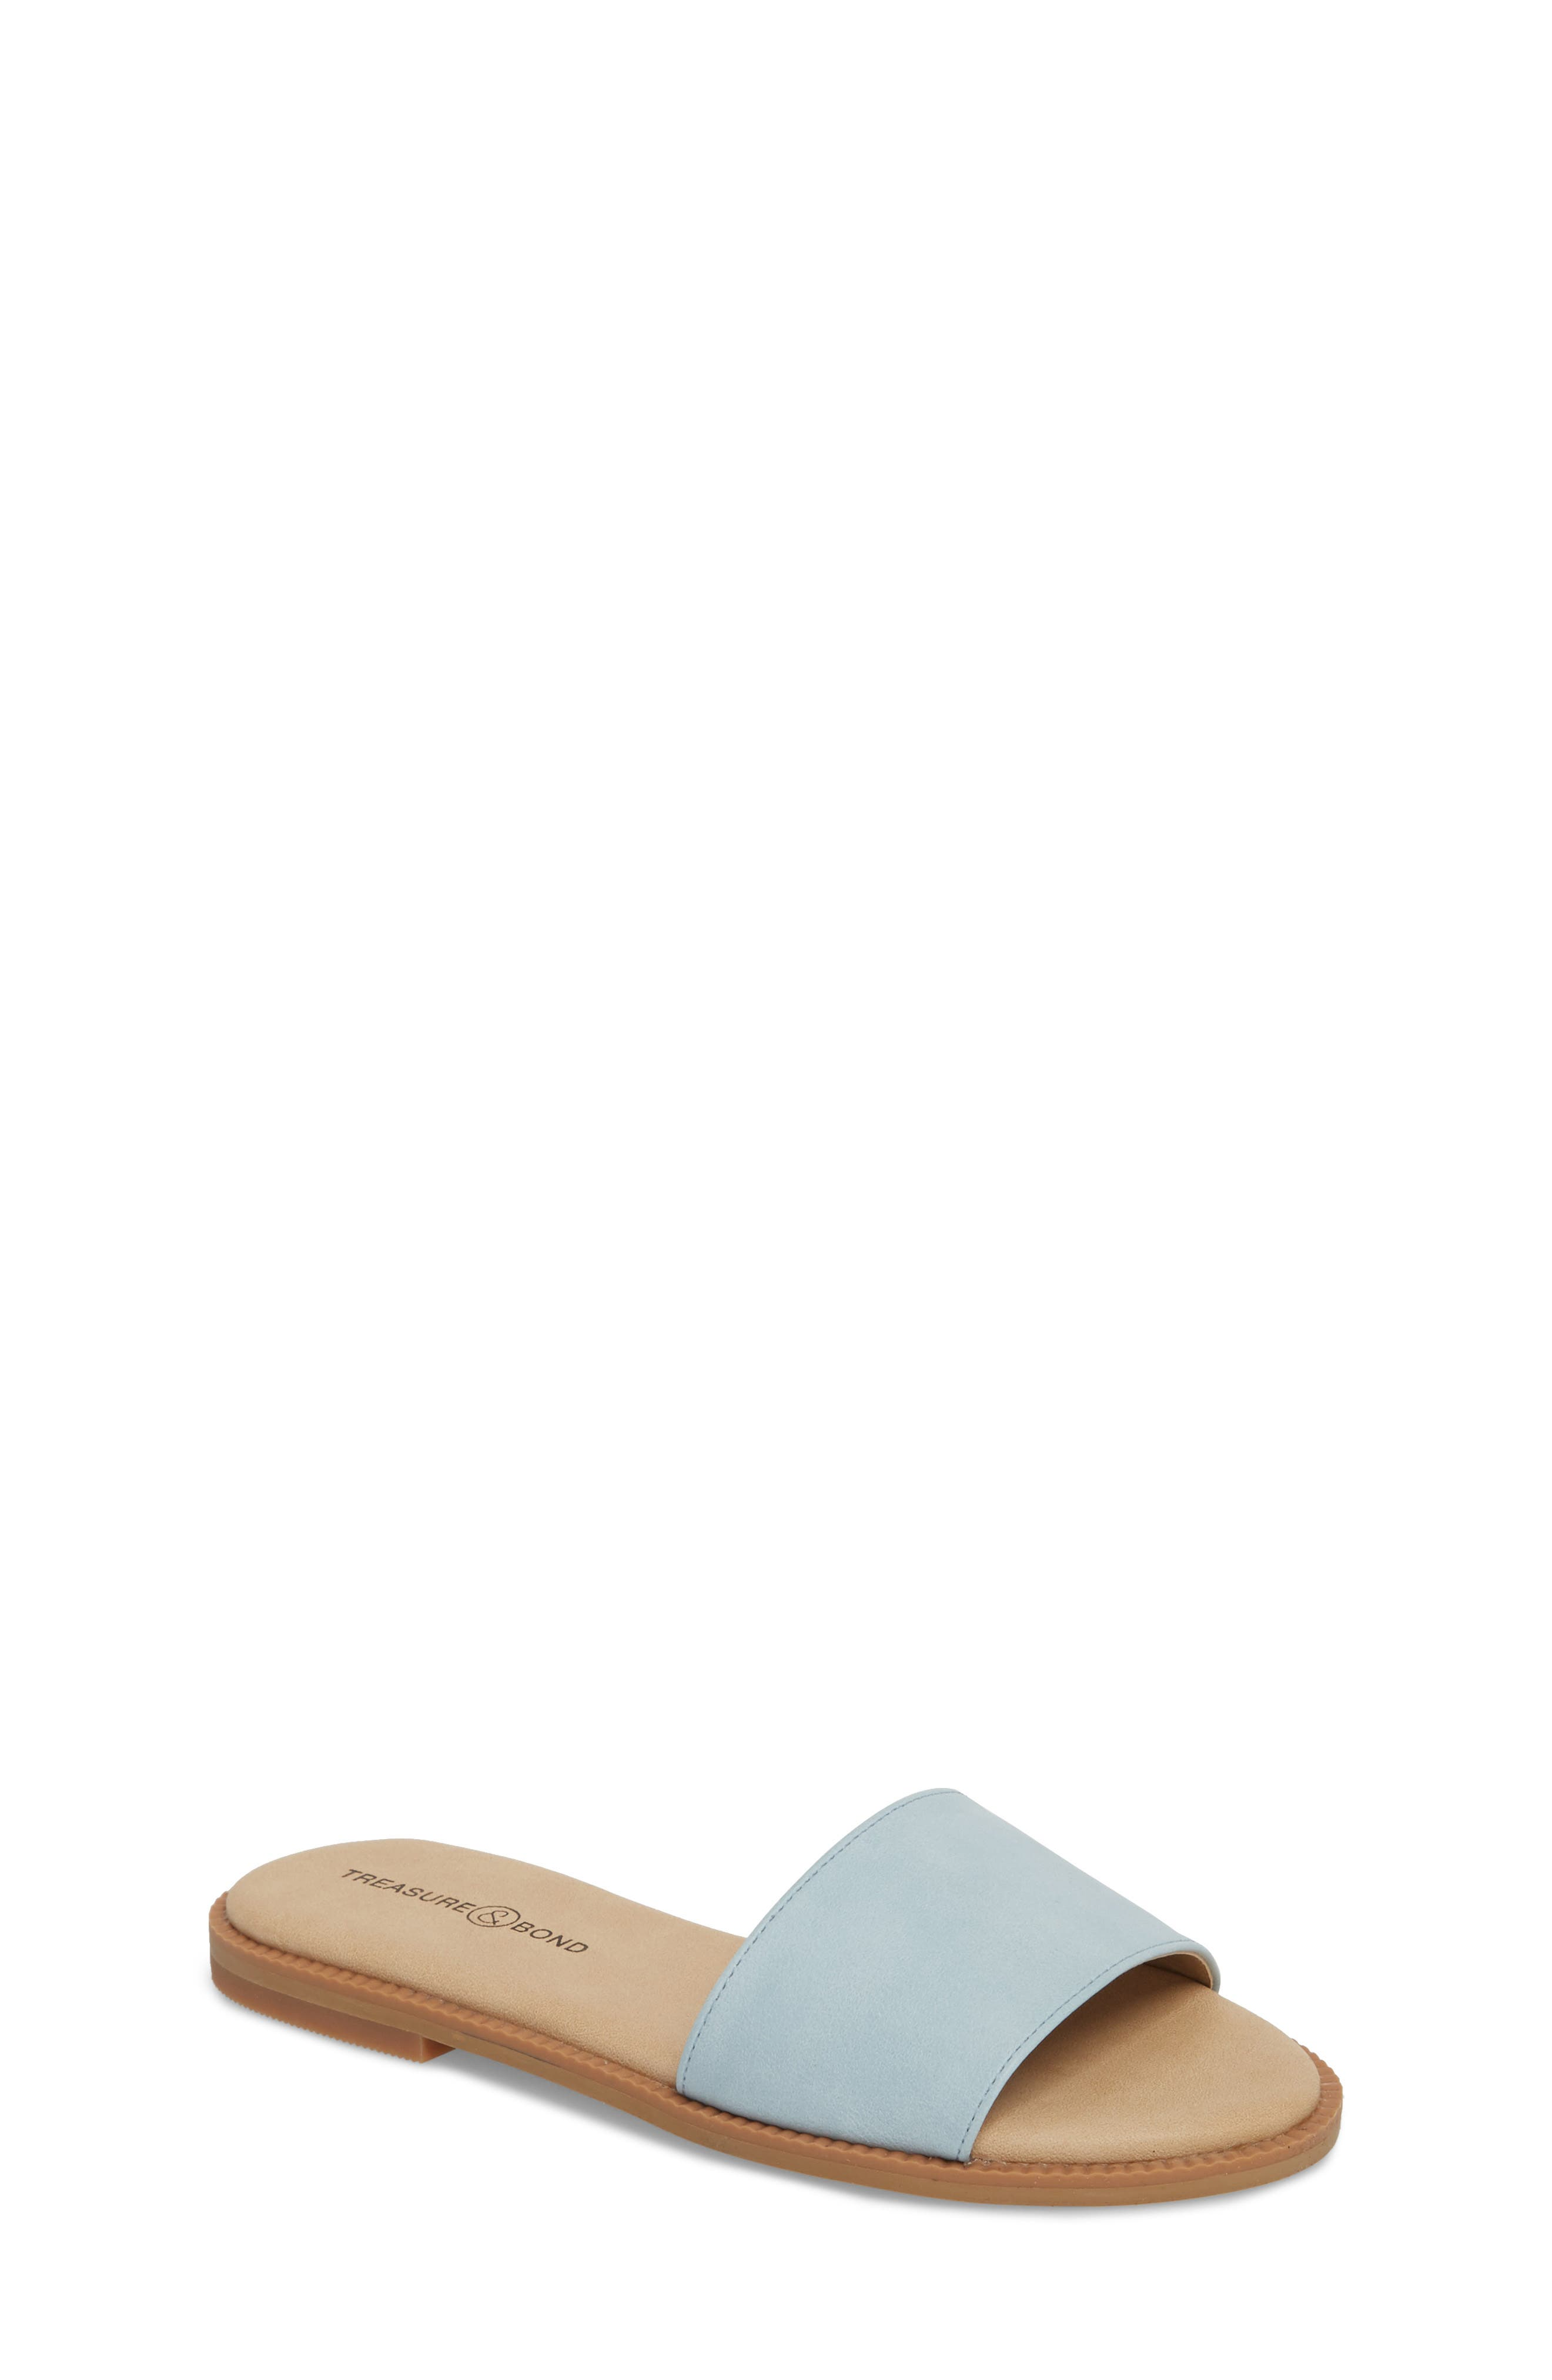 Mia Slide Sandal,                             Main thumbnail 1, color,                             Aqua Faux Leather